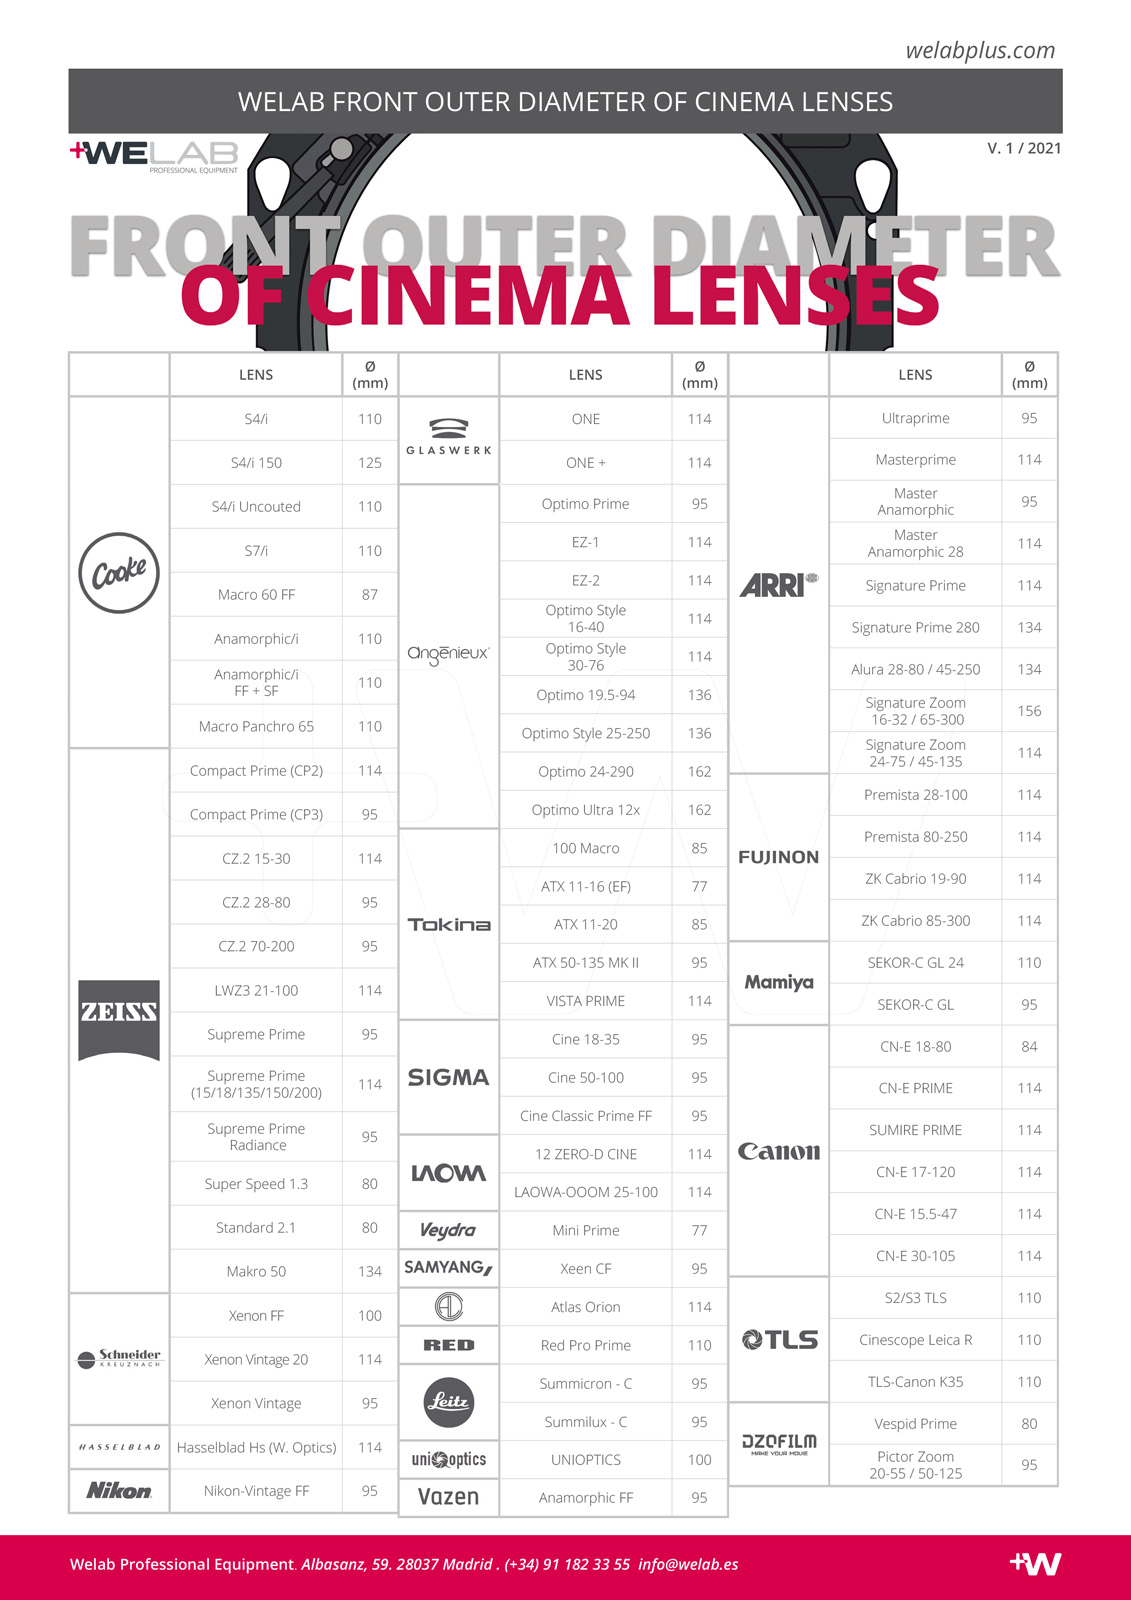 FRONT OUTER DIAMETER OF CINEMA LENSES COMPARISON WELAB PLUS